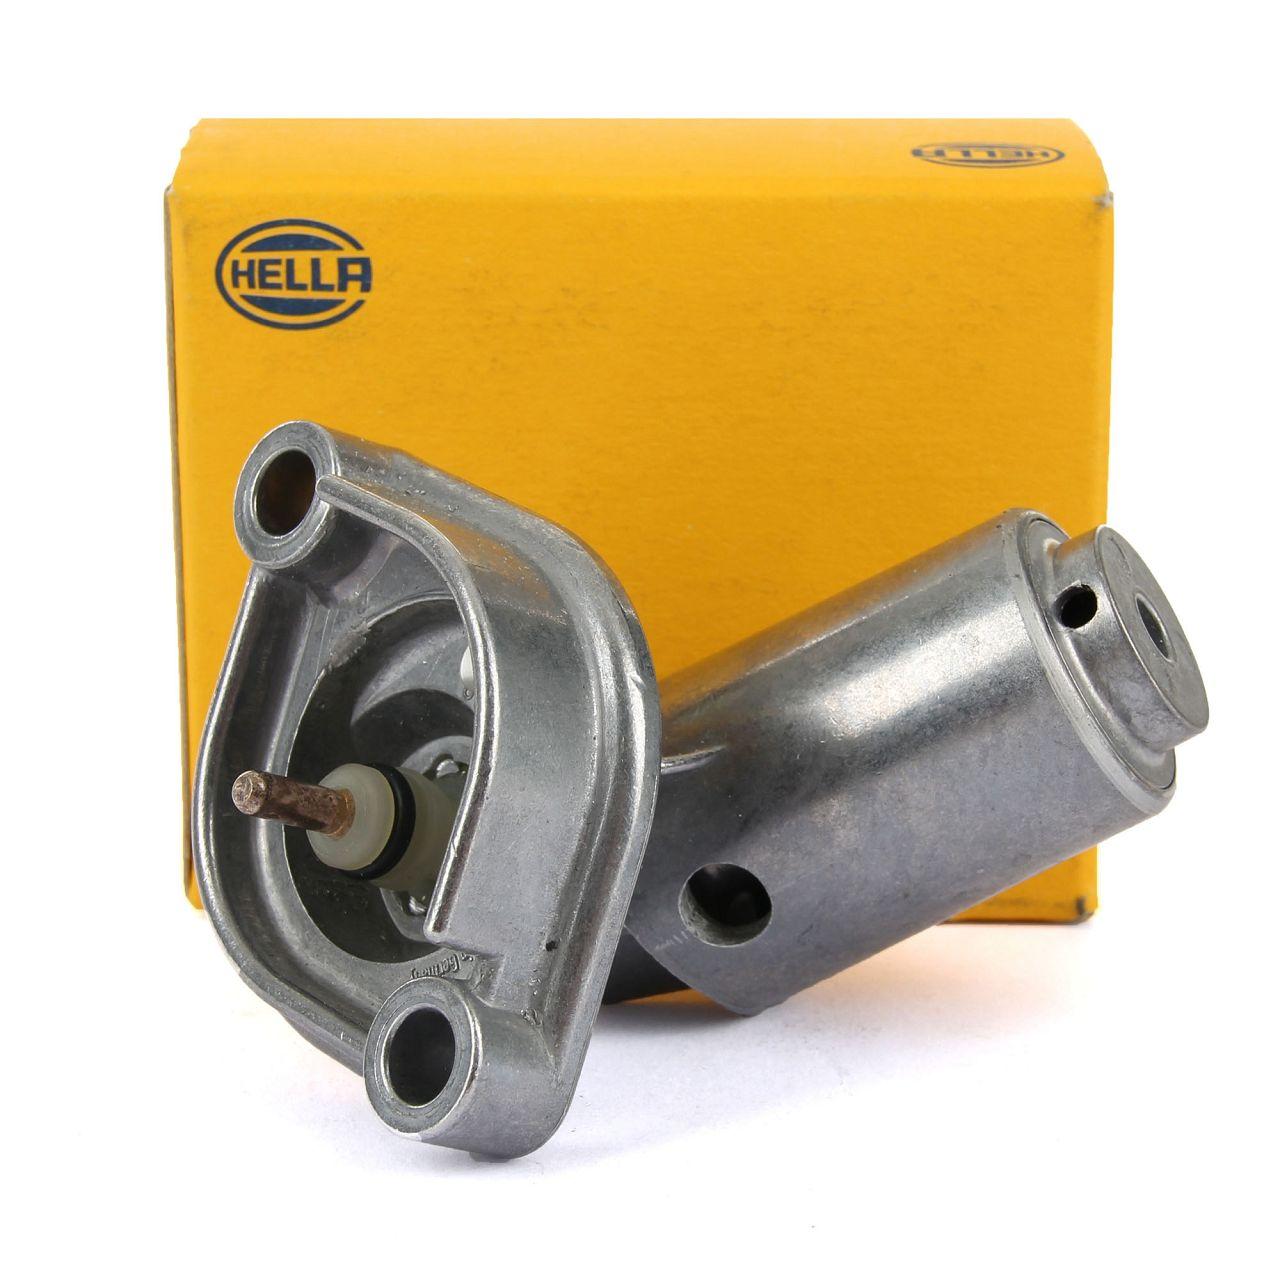 HELLA Ölniveausensor Ölstandsensor Motorölstand MERCEDES-BENZ 1245420017